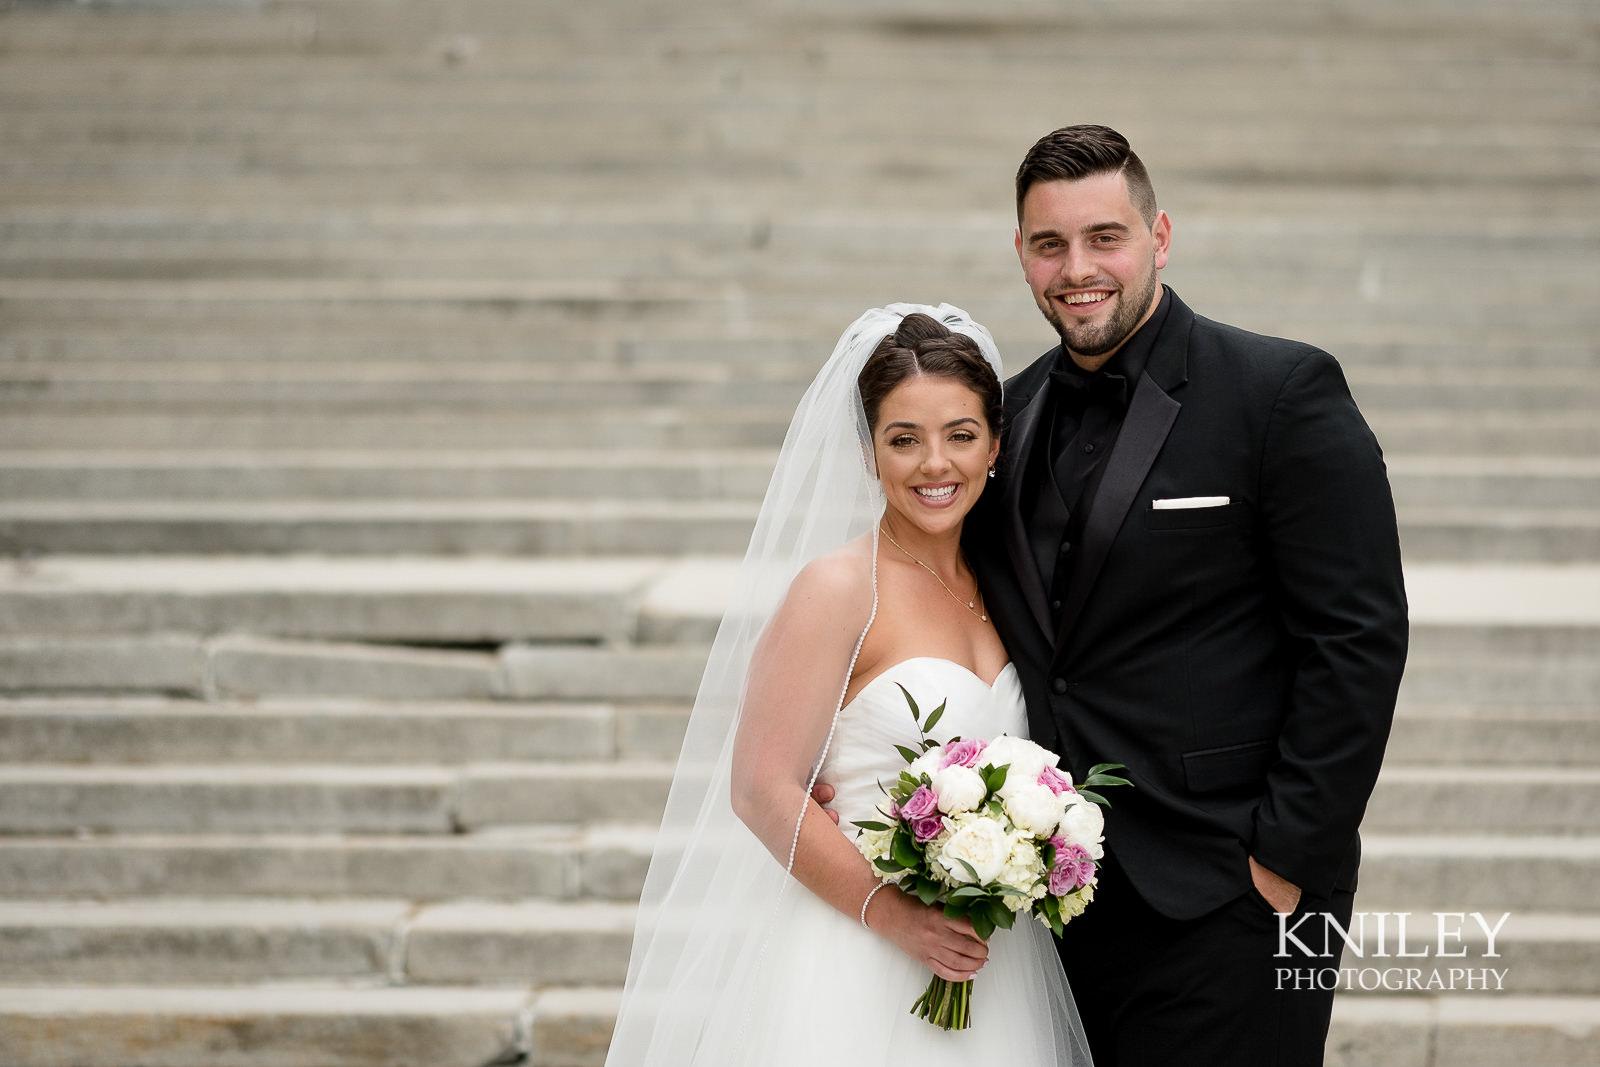 039 - Hoyt Lake Buffalo NY Wedding Pictures -XT2A7640.jpg